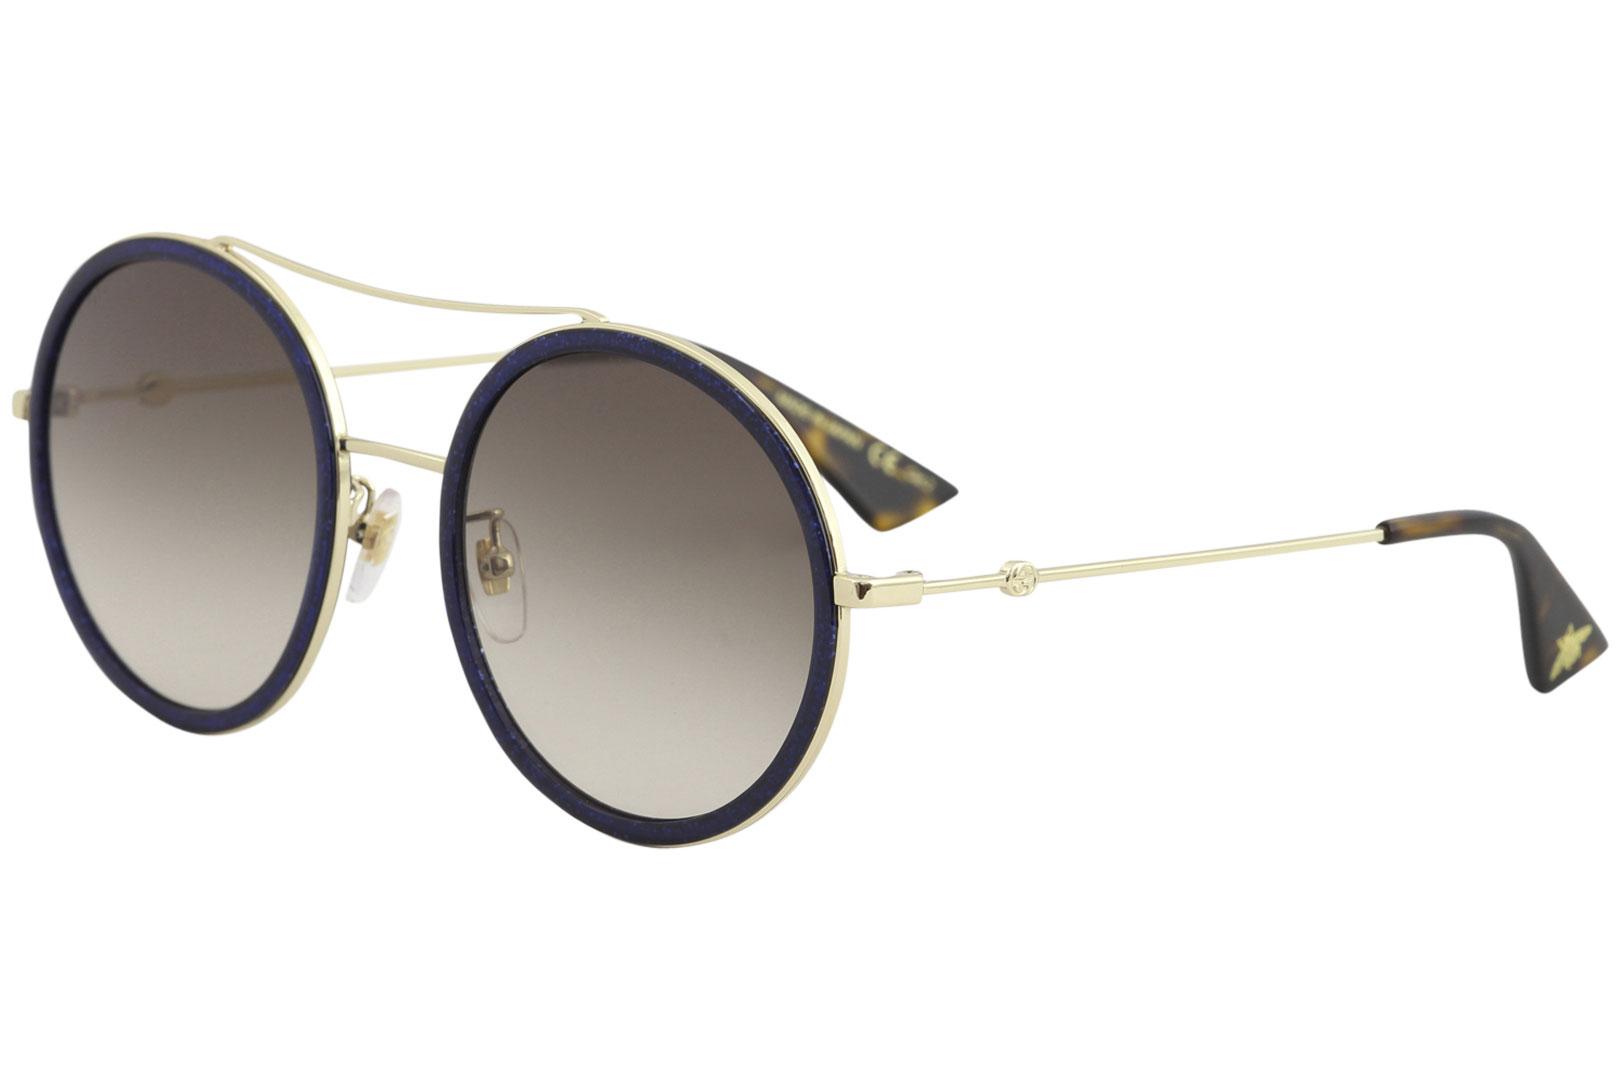 012b1272a7aa Gucci Women s GG0061S GG 0061S 005 Gold Navy Round Sunglasses 56mm ...